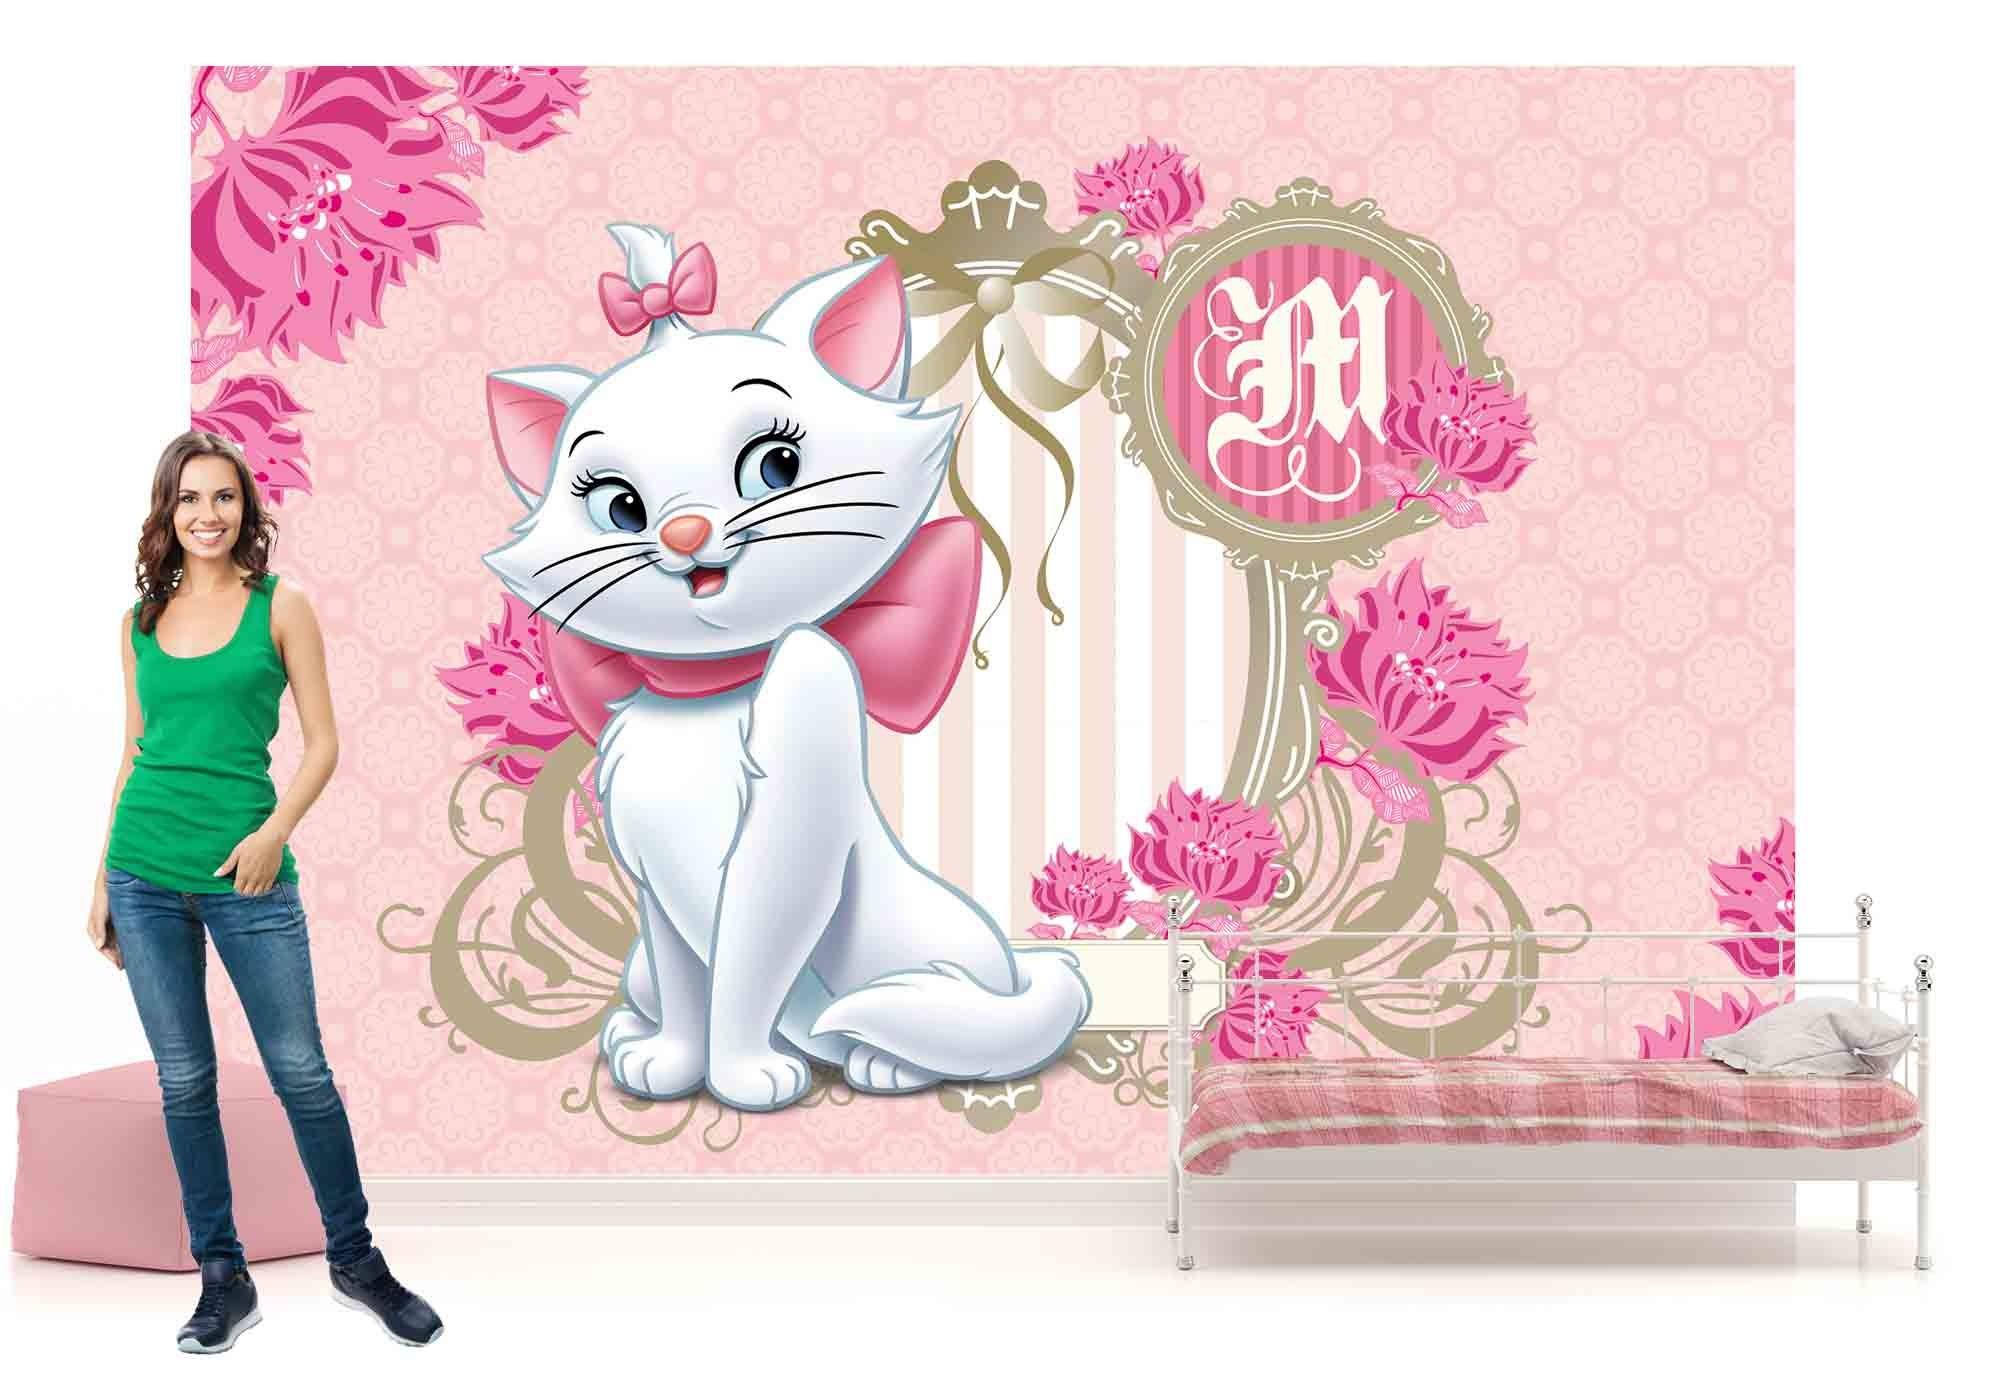 Cute Hello Kitty Wallpaper Cell Phone Marie Aristocats Wallpaper 183 ① Wallpapertag